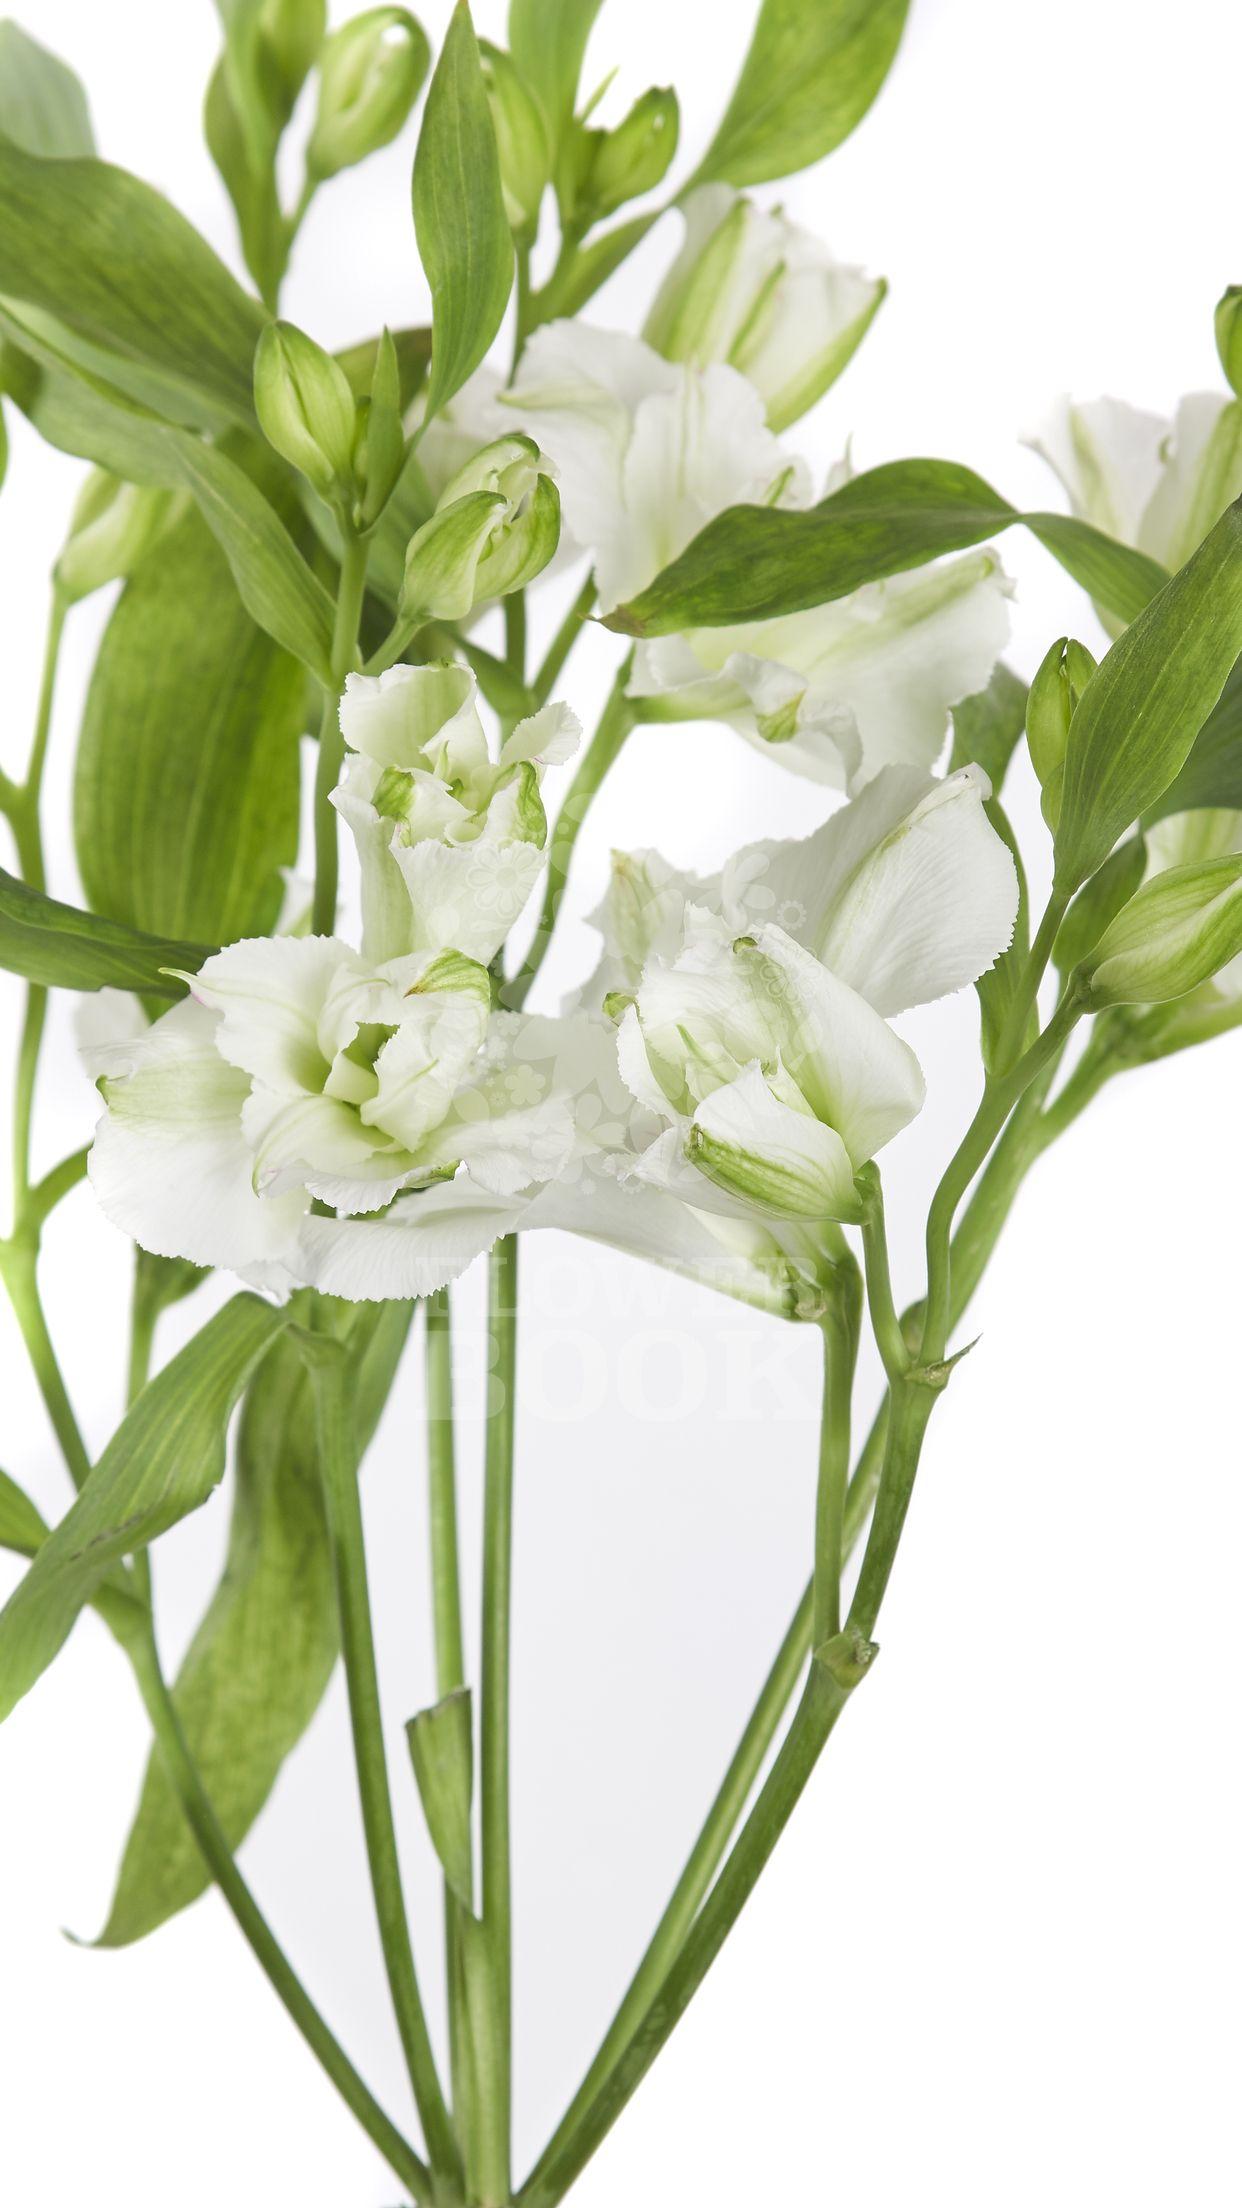 32 Different Types Of Alstroemeria Flowers Alstroemeria Flowers Peruvian Lilies